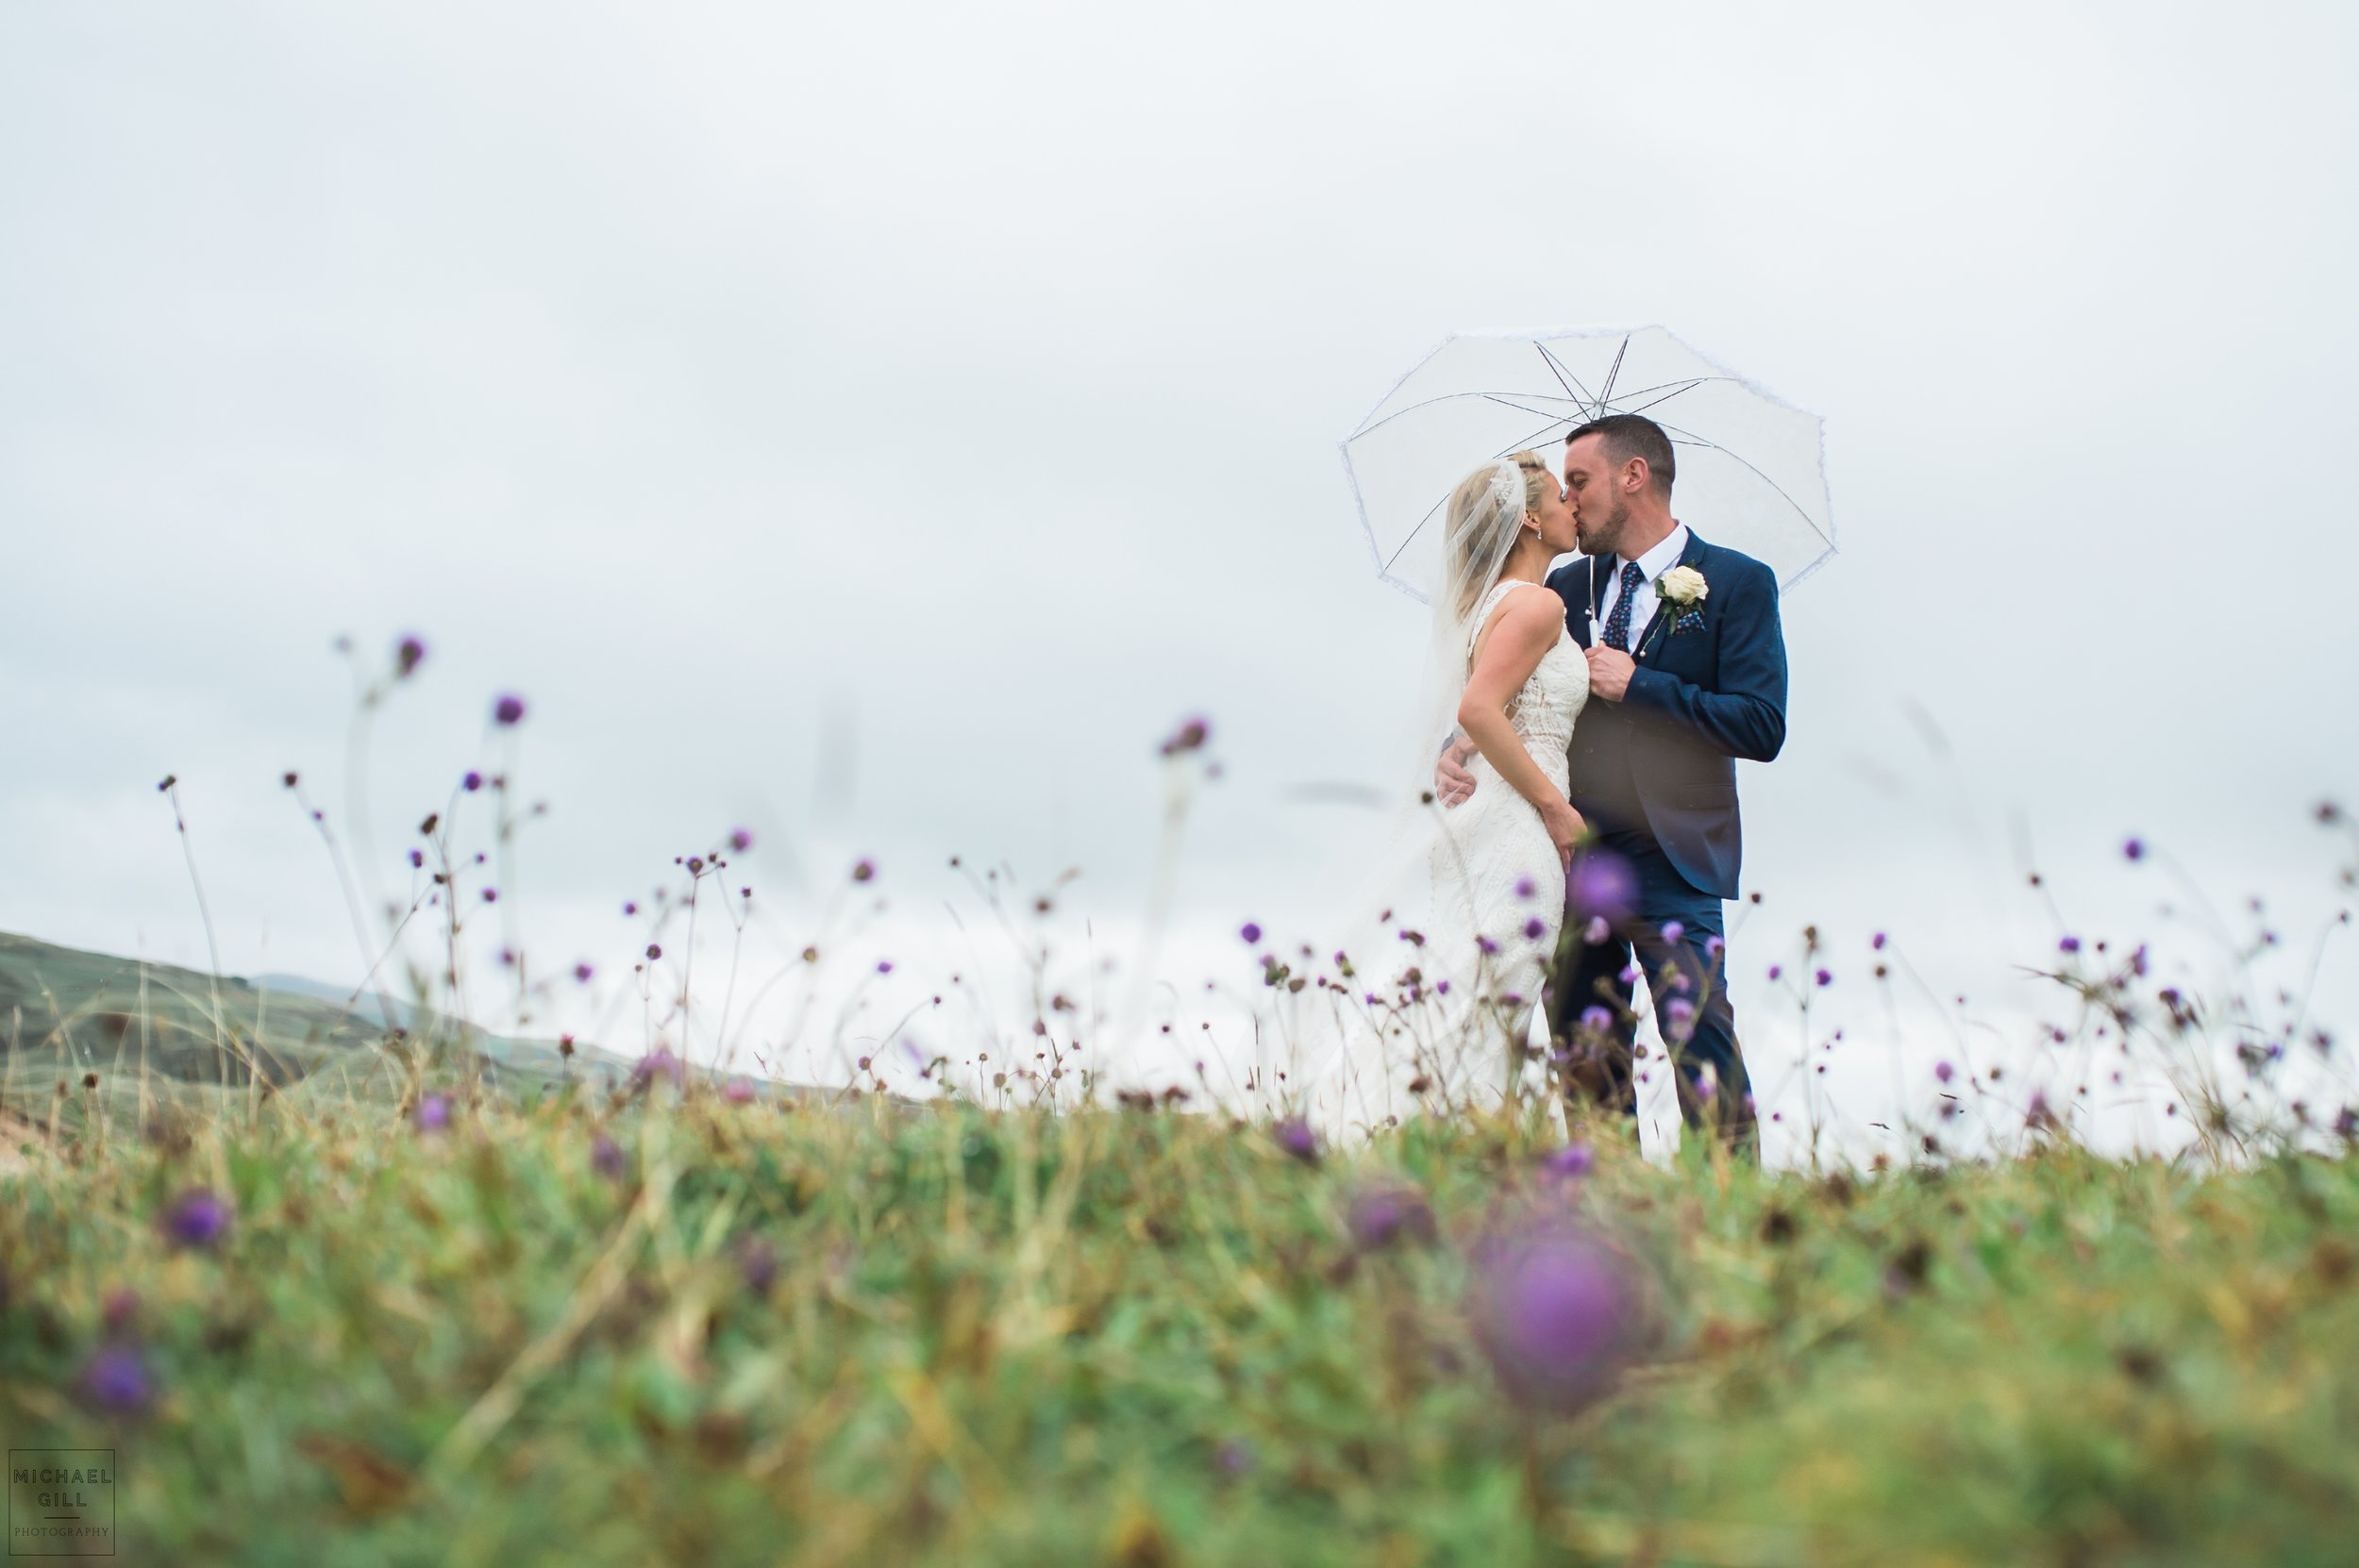 Michael_Gill_Photography_Wedding_Ballyliffin011.JPG